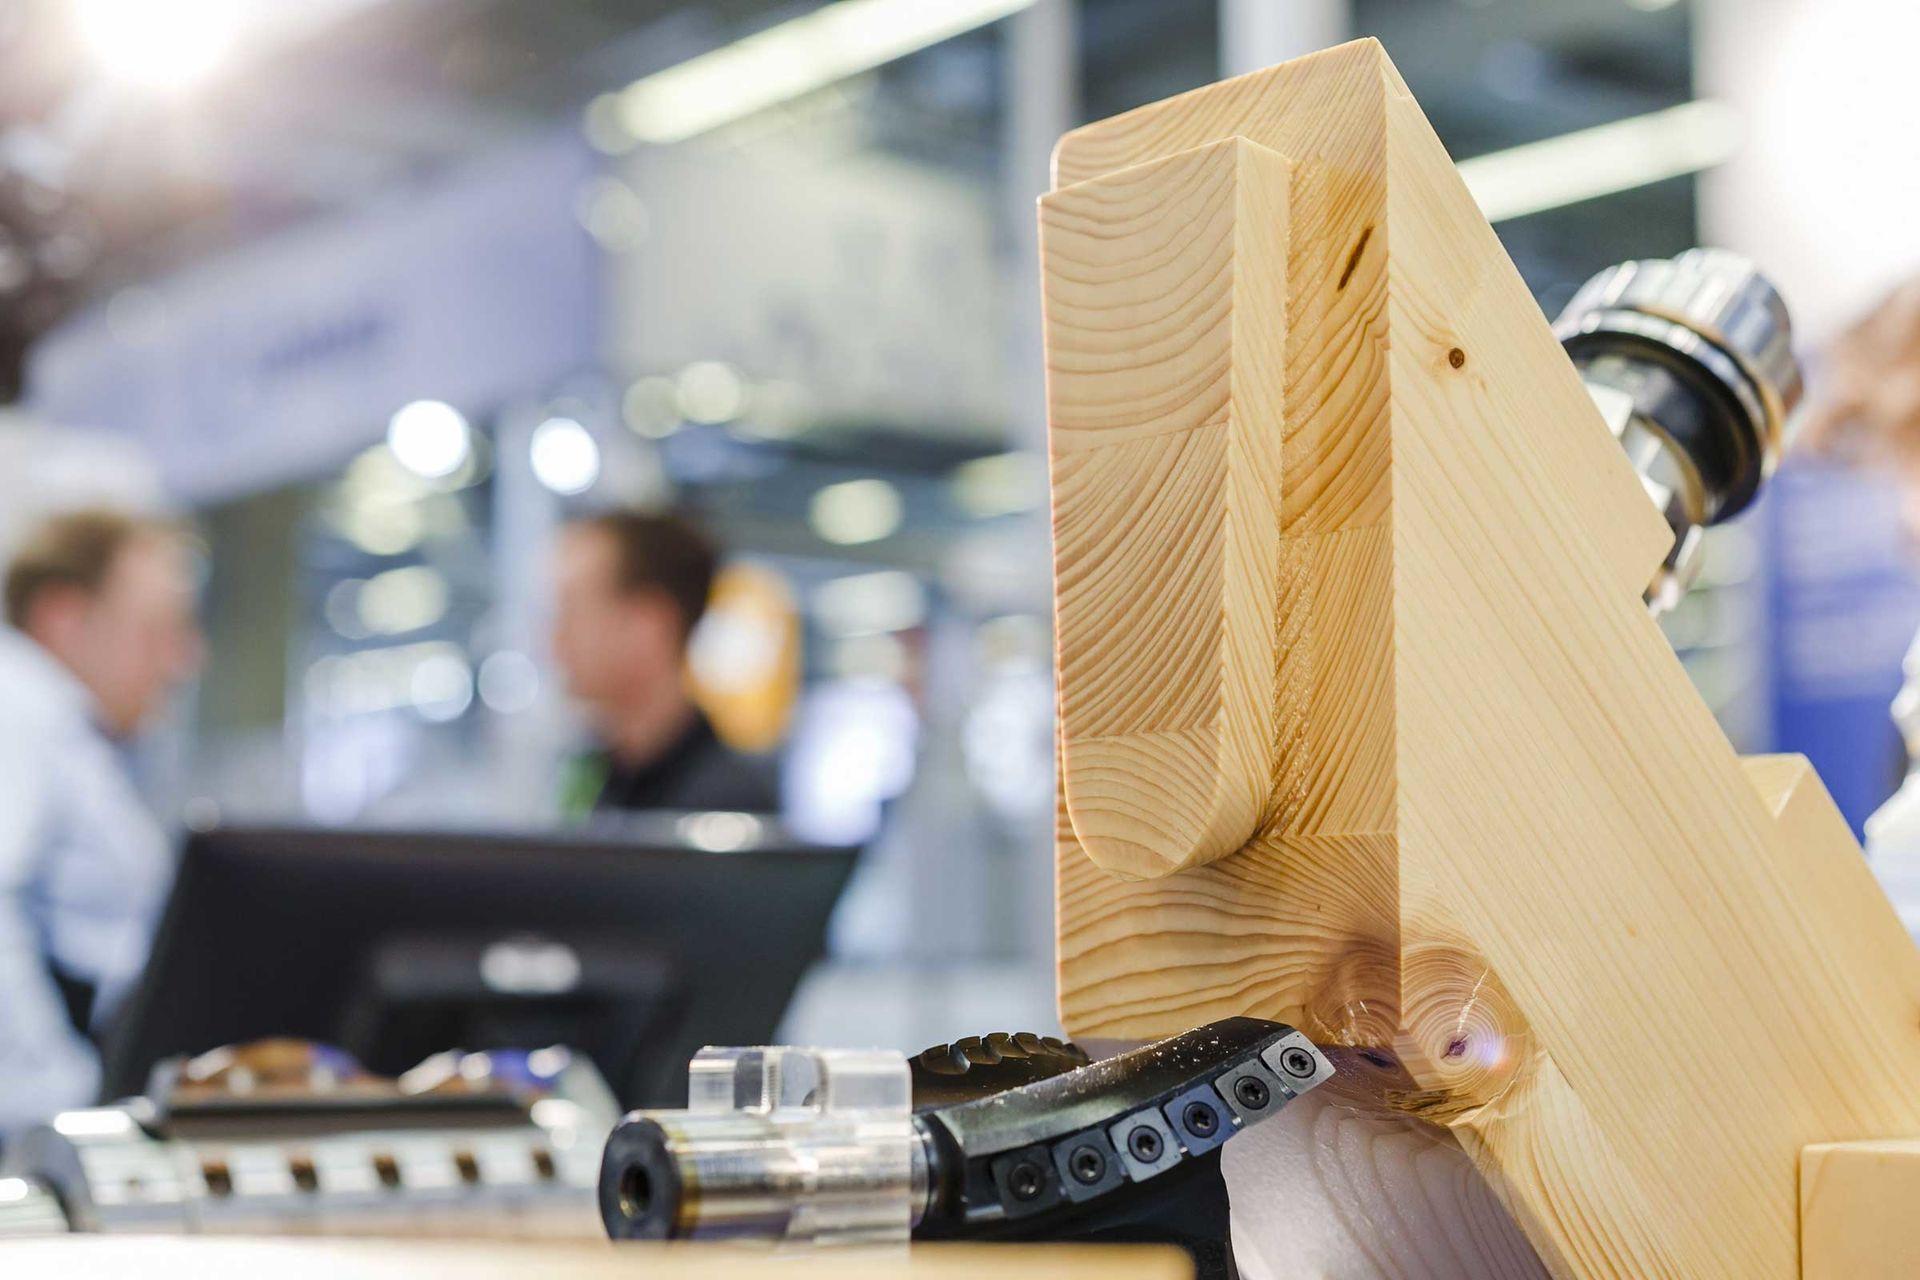 Holz-Handwerk 2019  HOLZ HANDWERK Newsroom